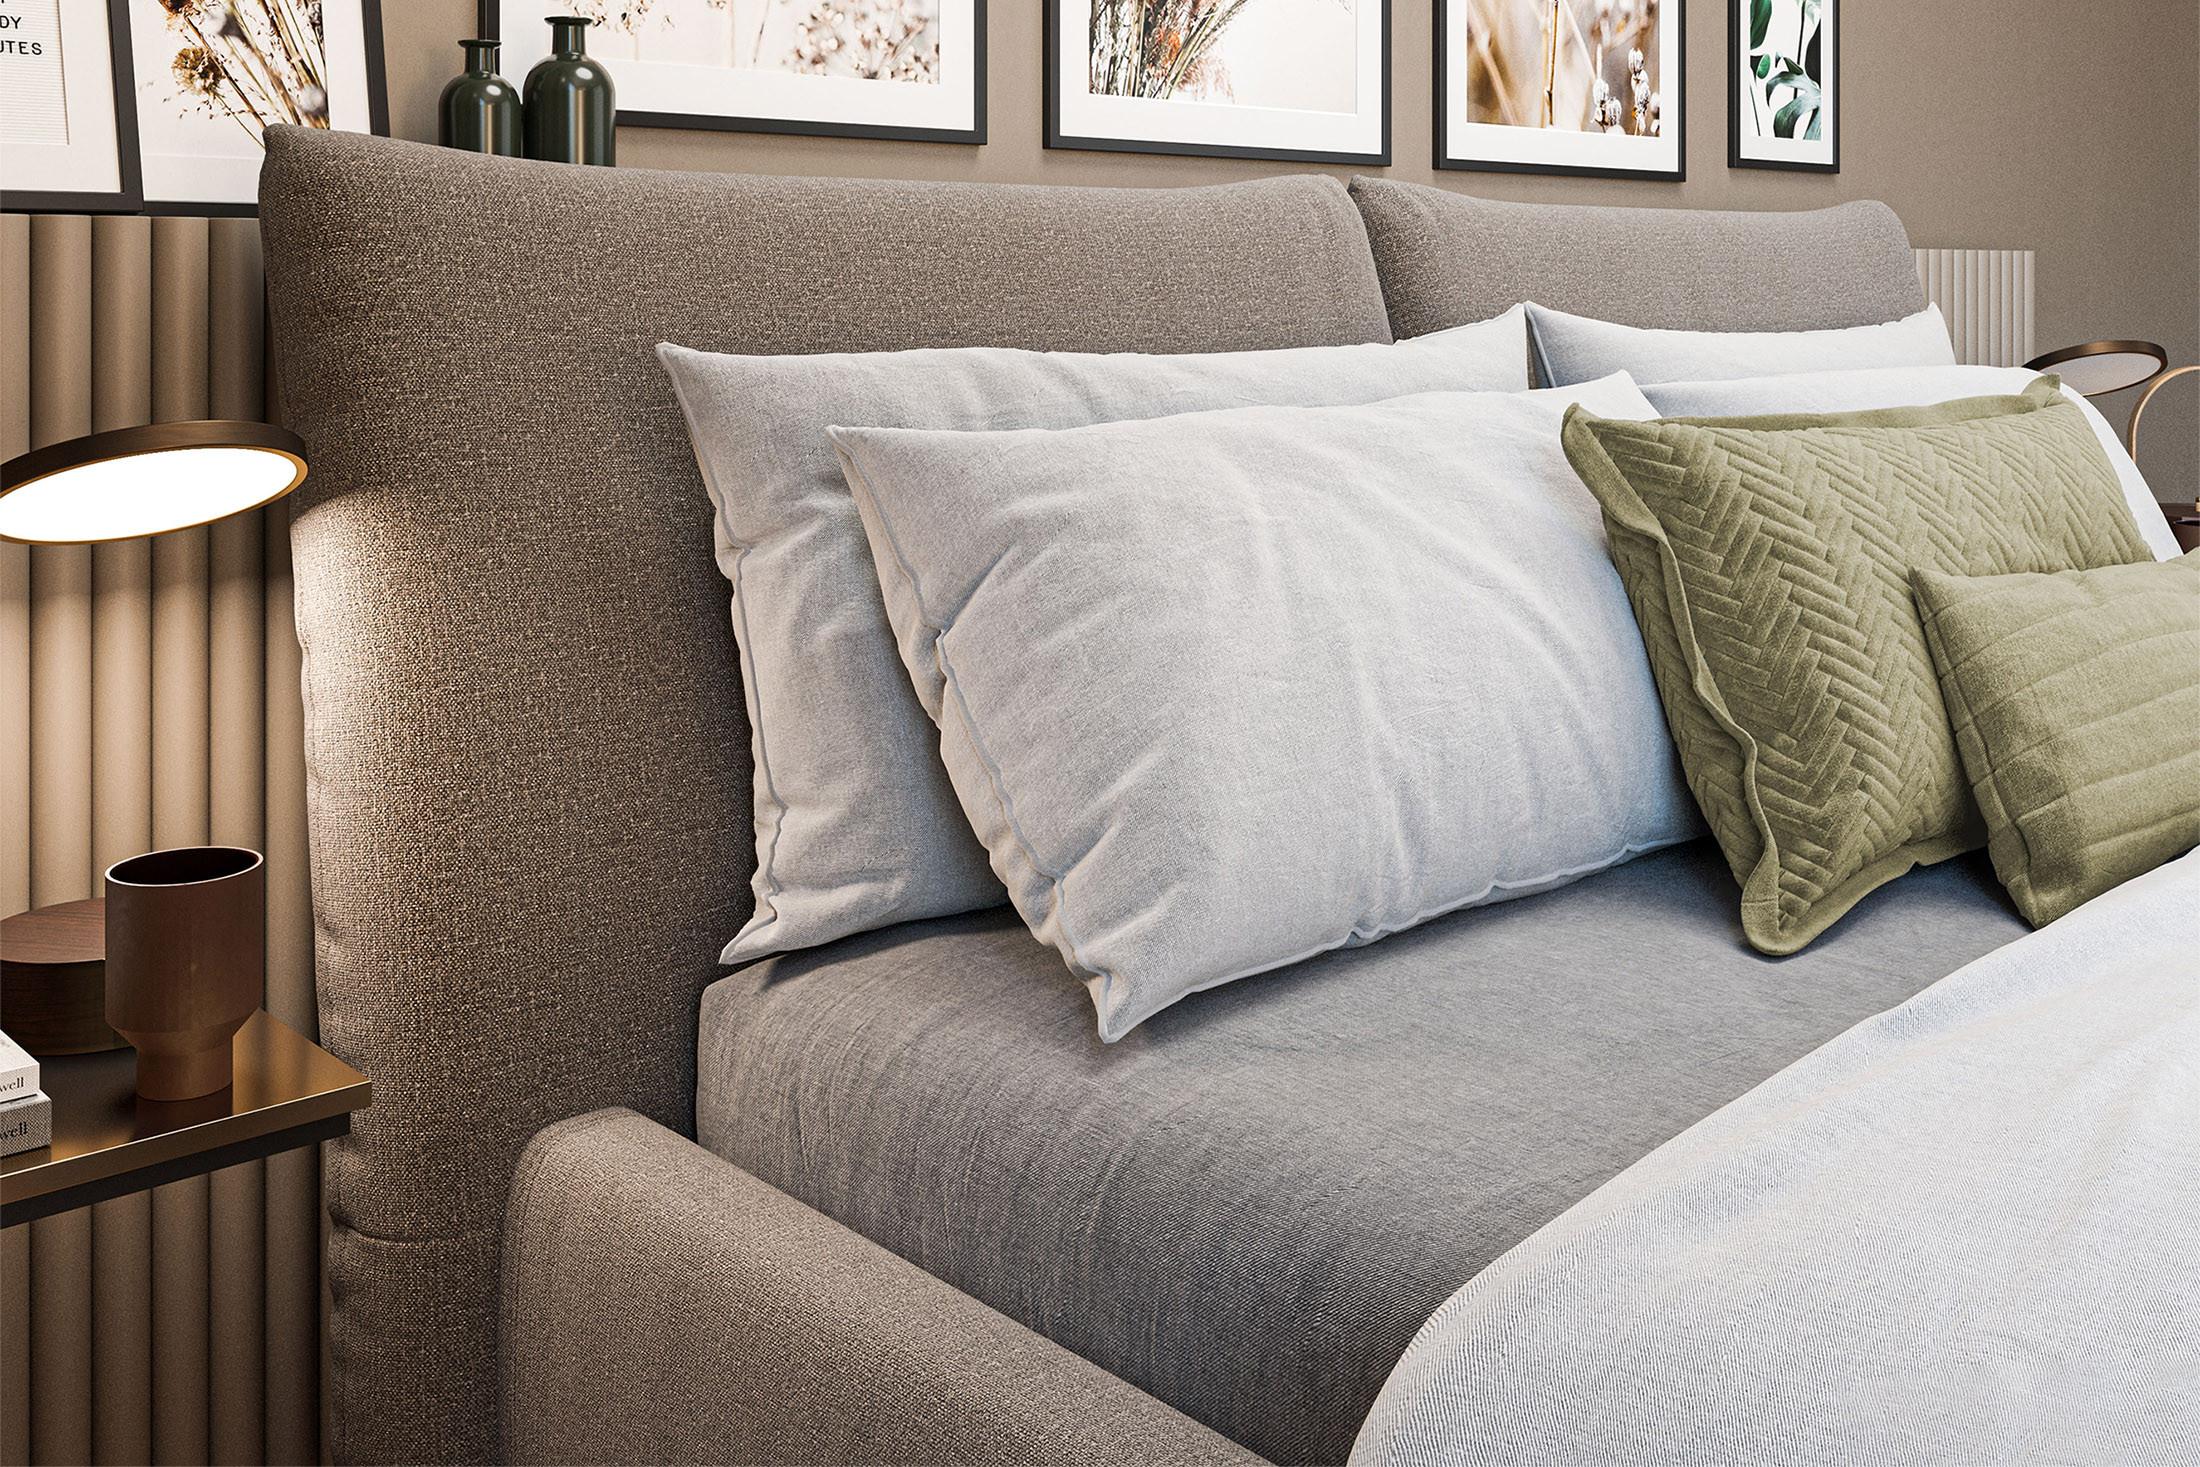 Polsterbett Id.504 In Domo In Grau | Möbel Letz - Ihr Online-Shop